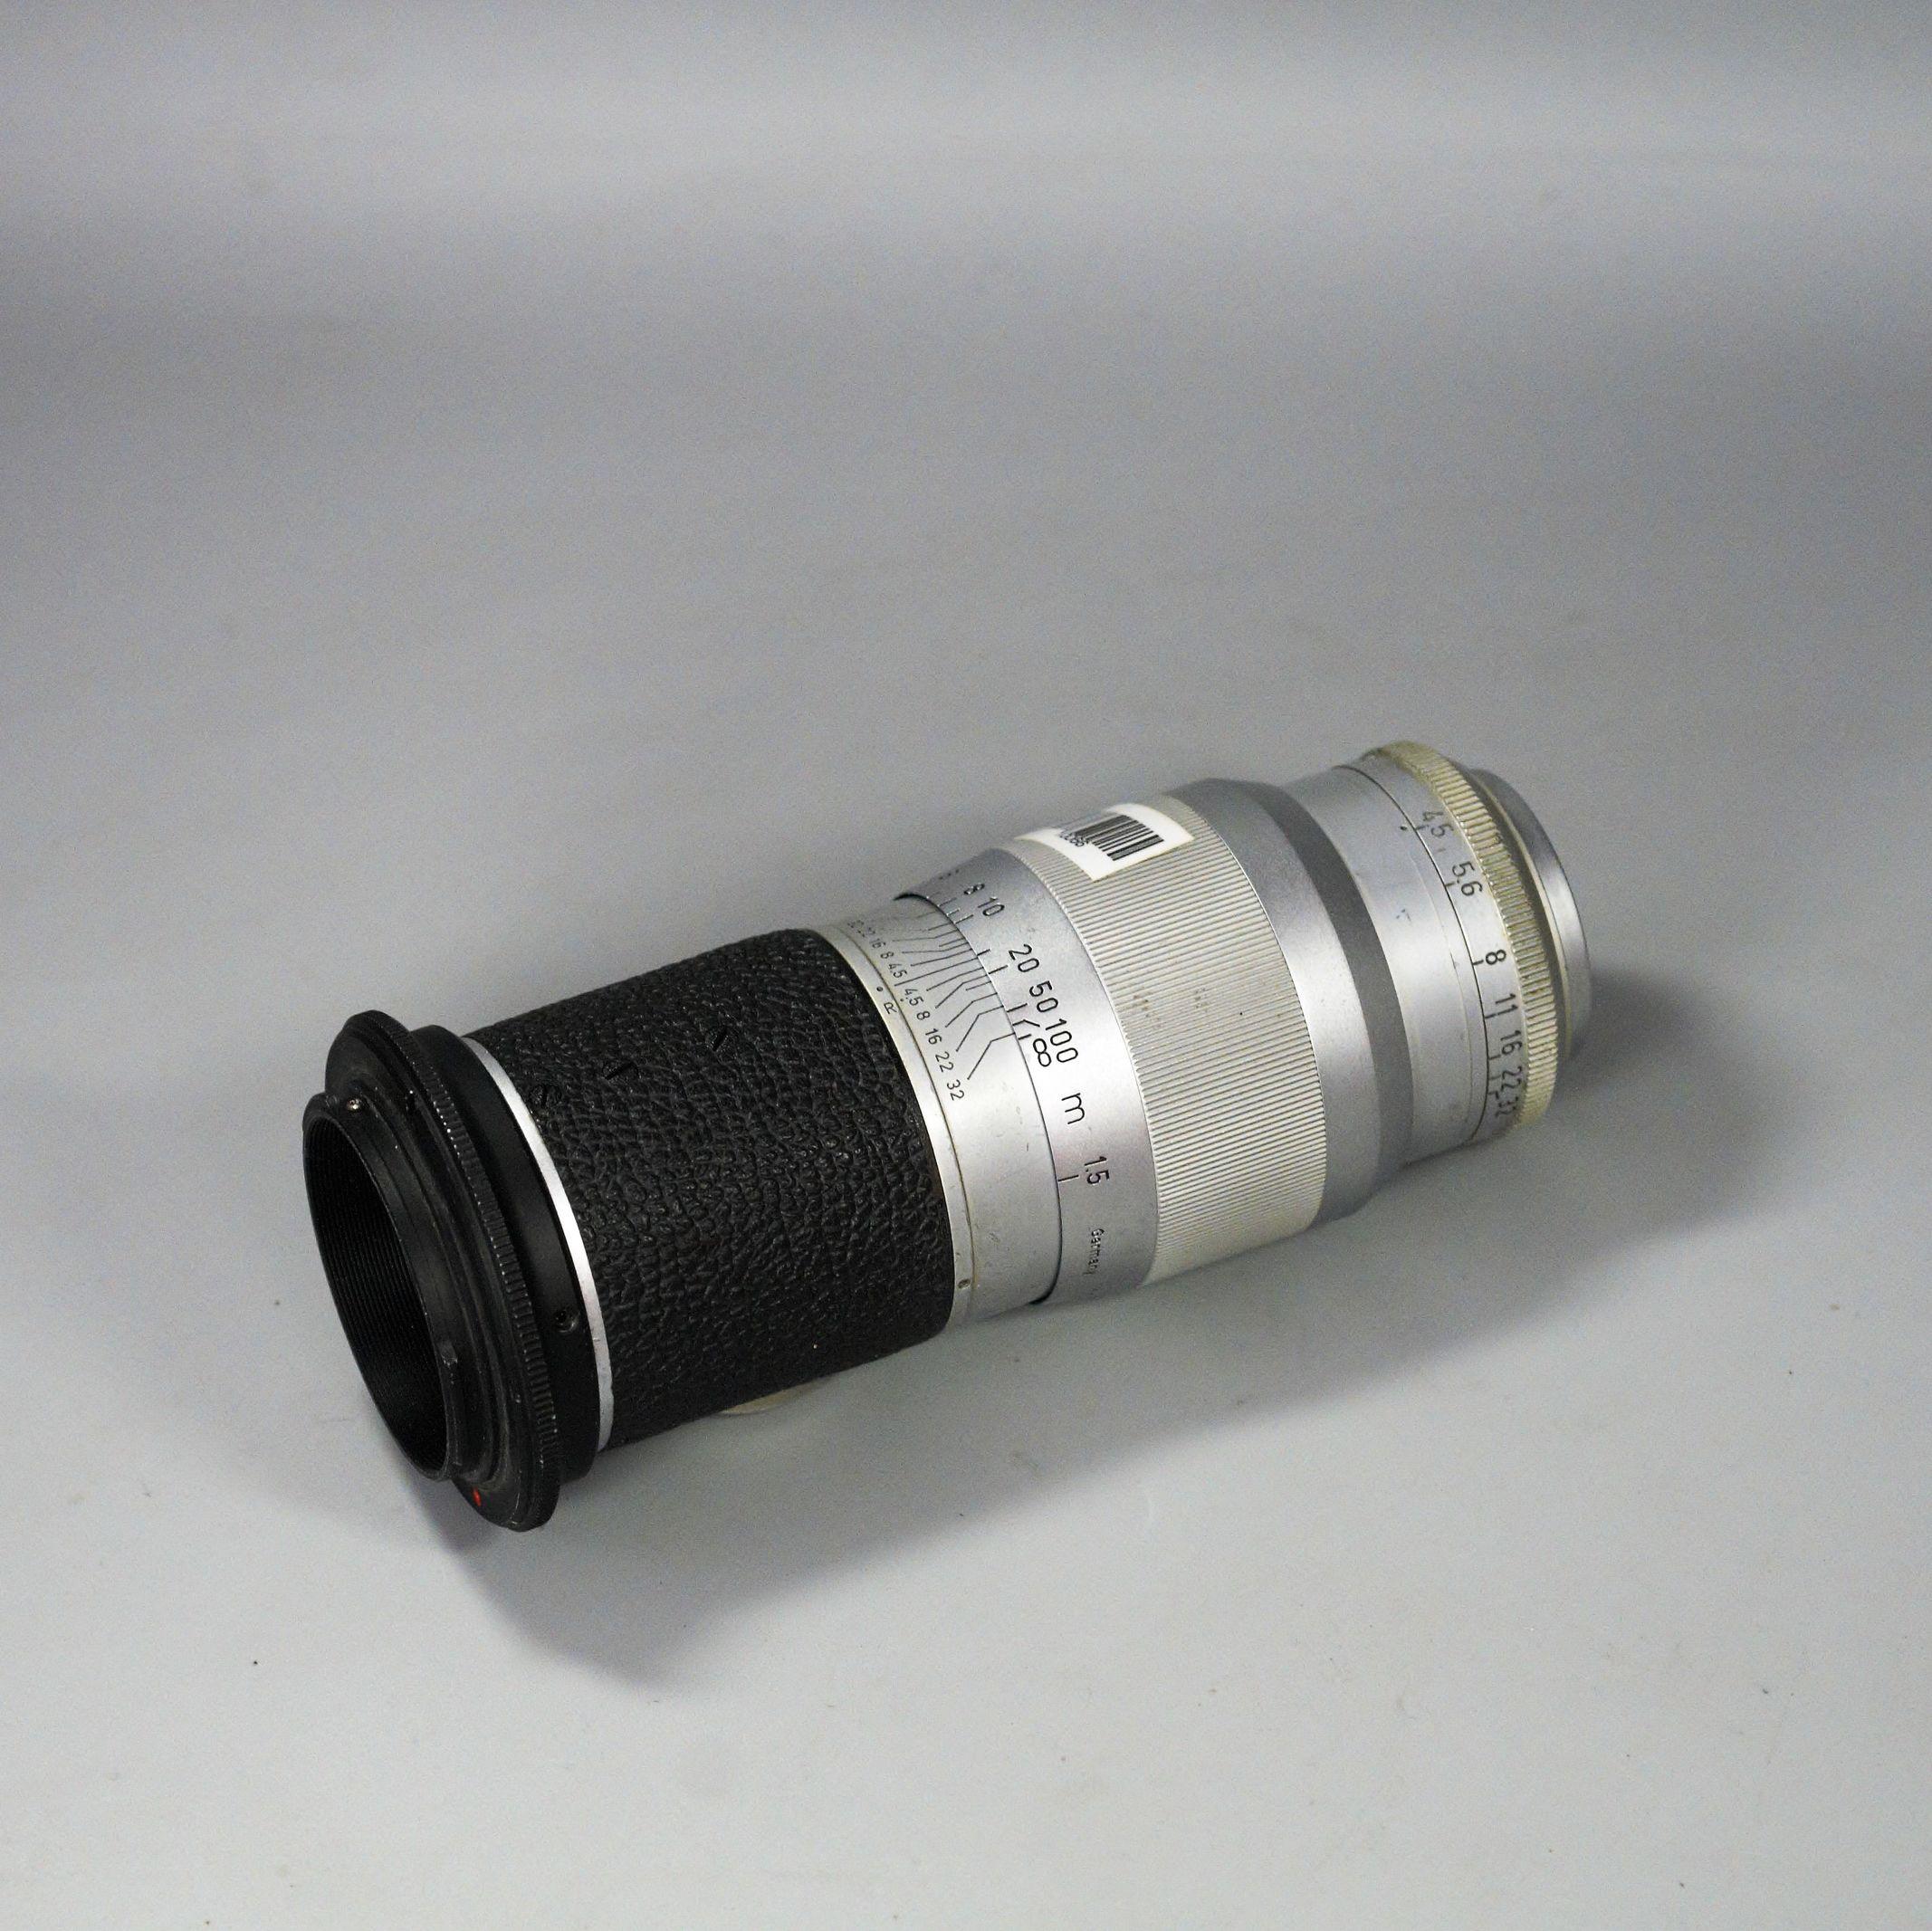 leica-m-135mm-f4-5-leitz-wetzlar-elmarit-mf-m39-135-4-5-10066